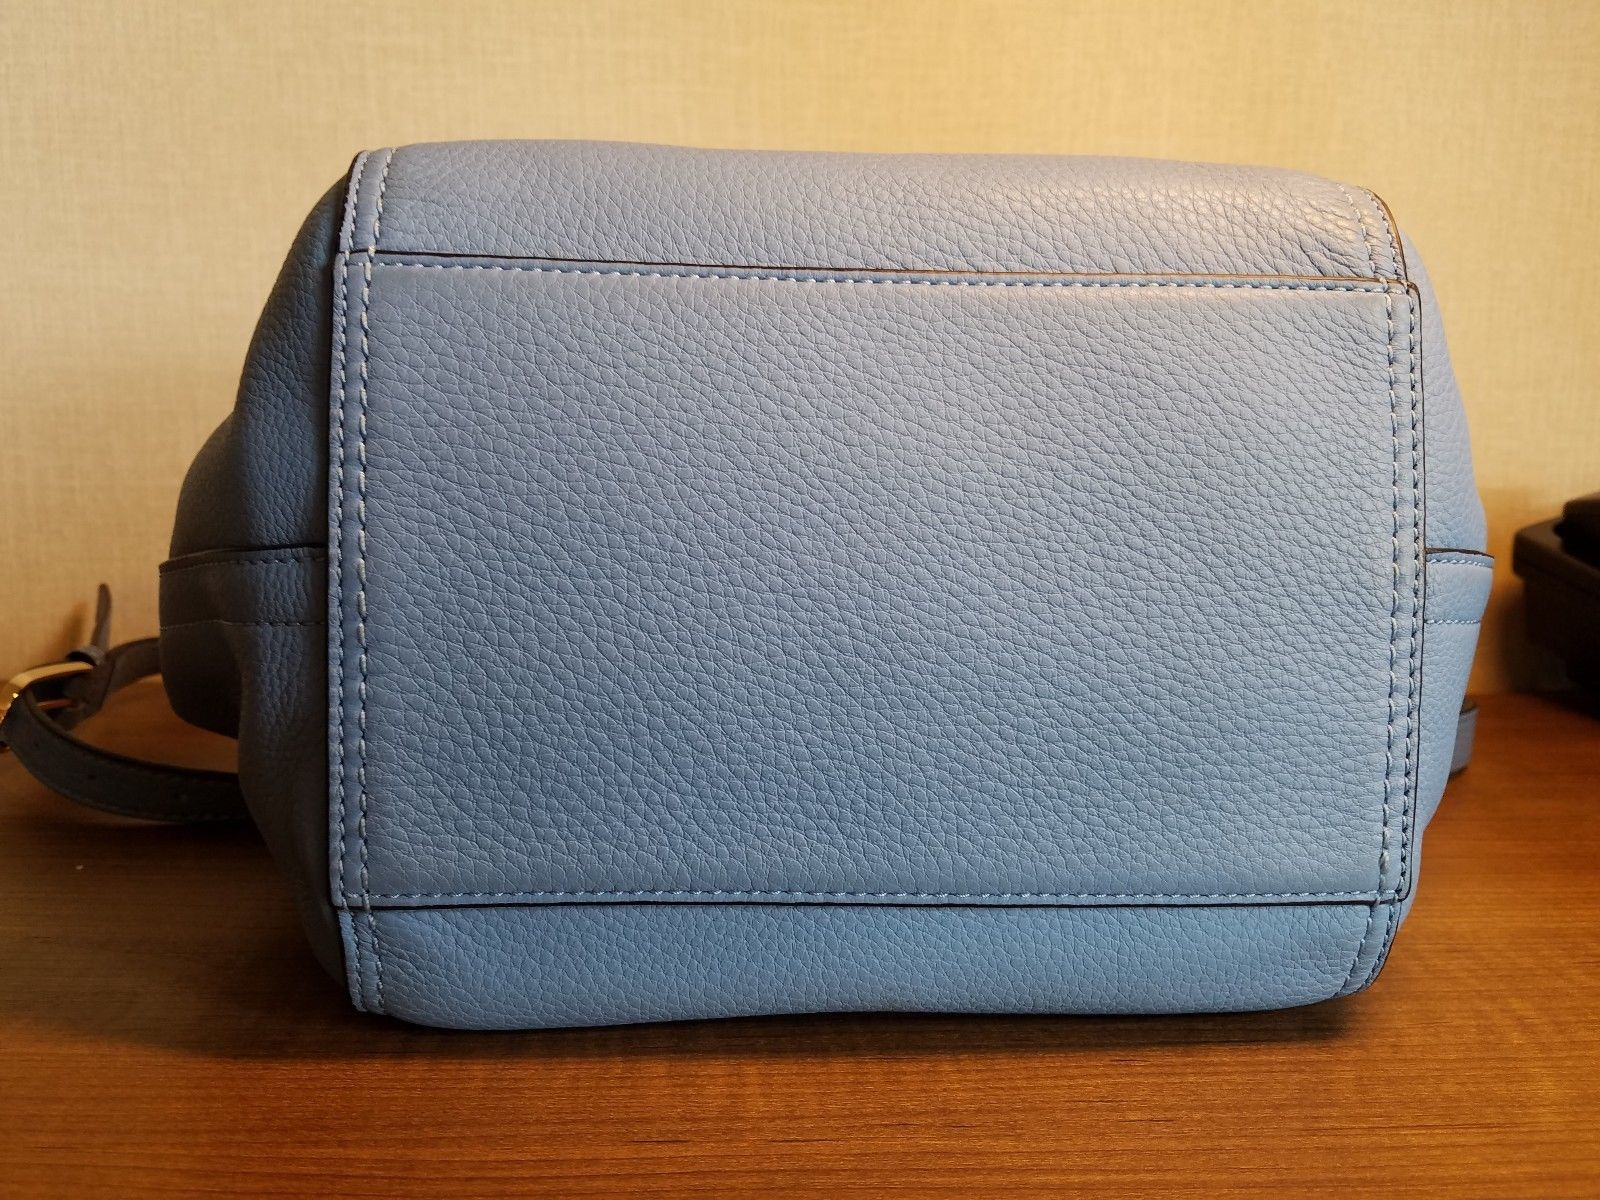 1b53bc8058e Tory Burch Half Moon Montego Blue Pebbled Leather Satchel Crossbody HandBag  NWOT